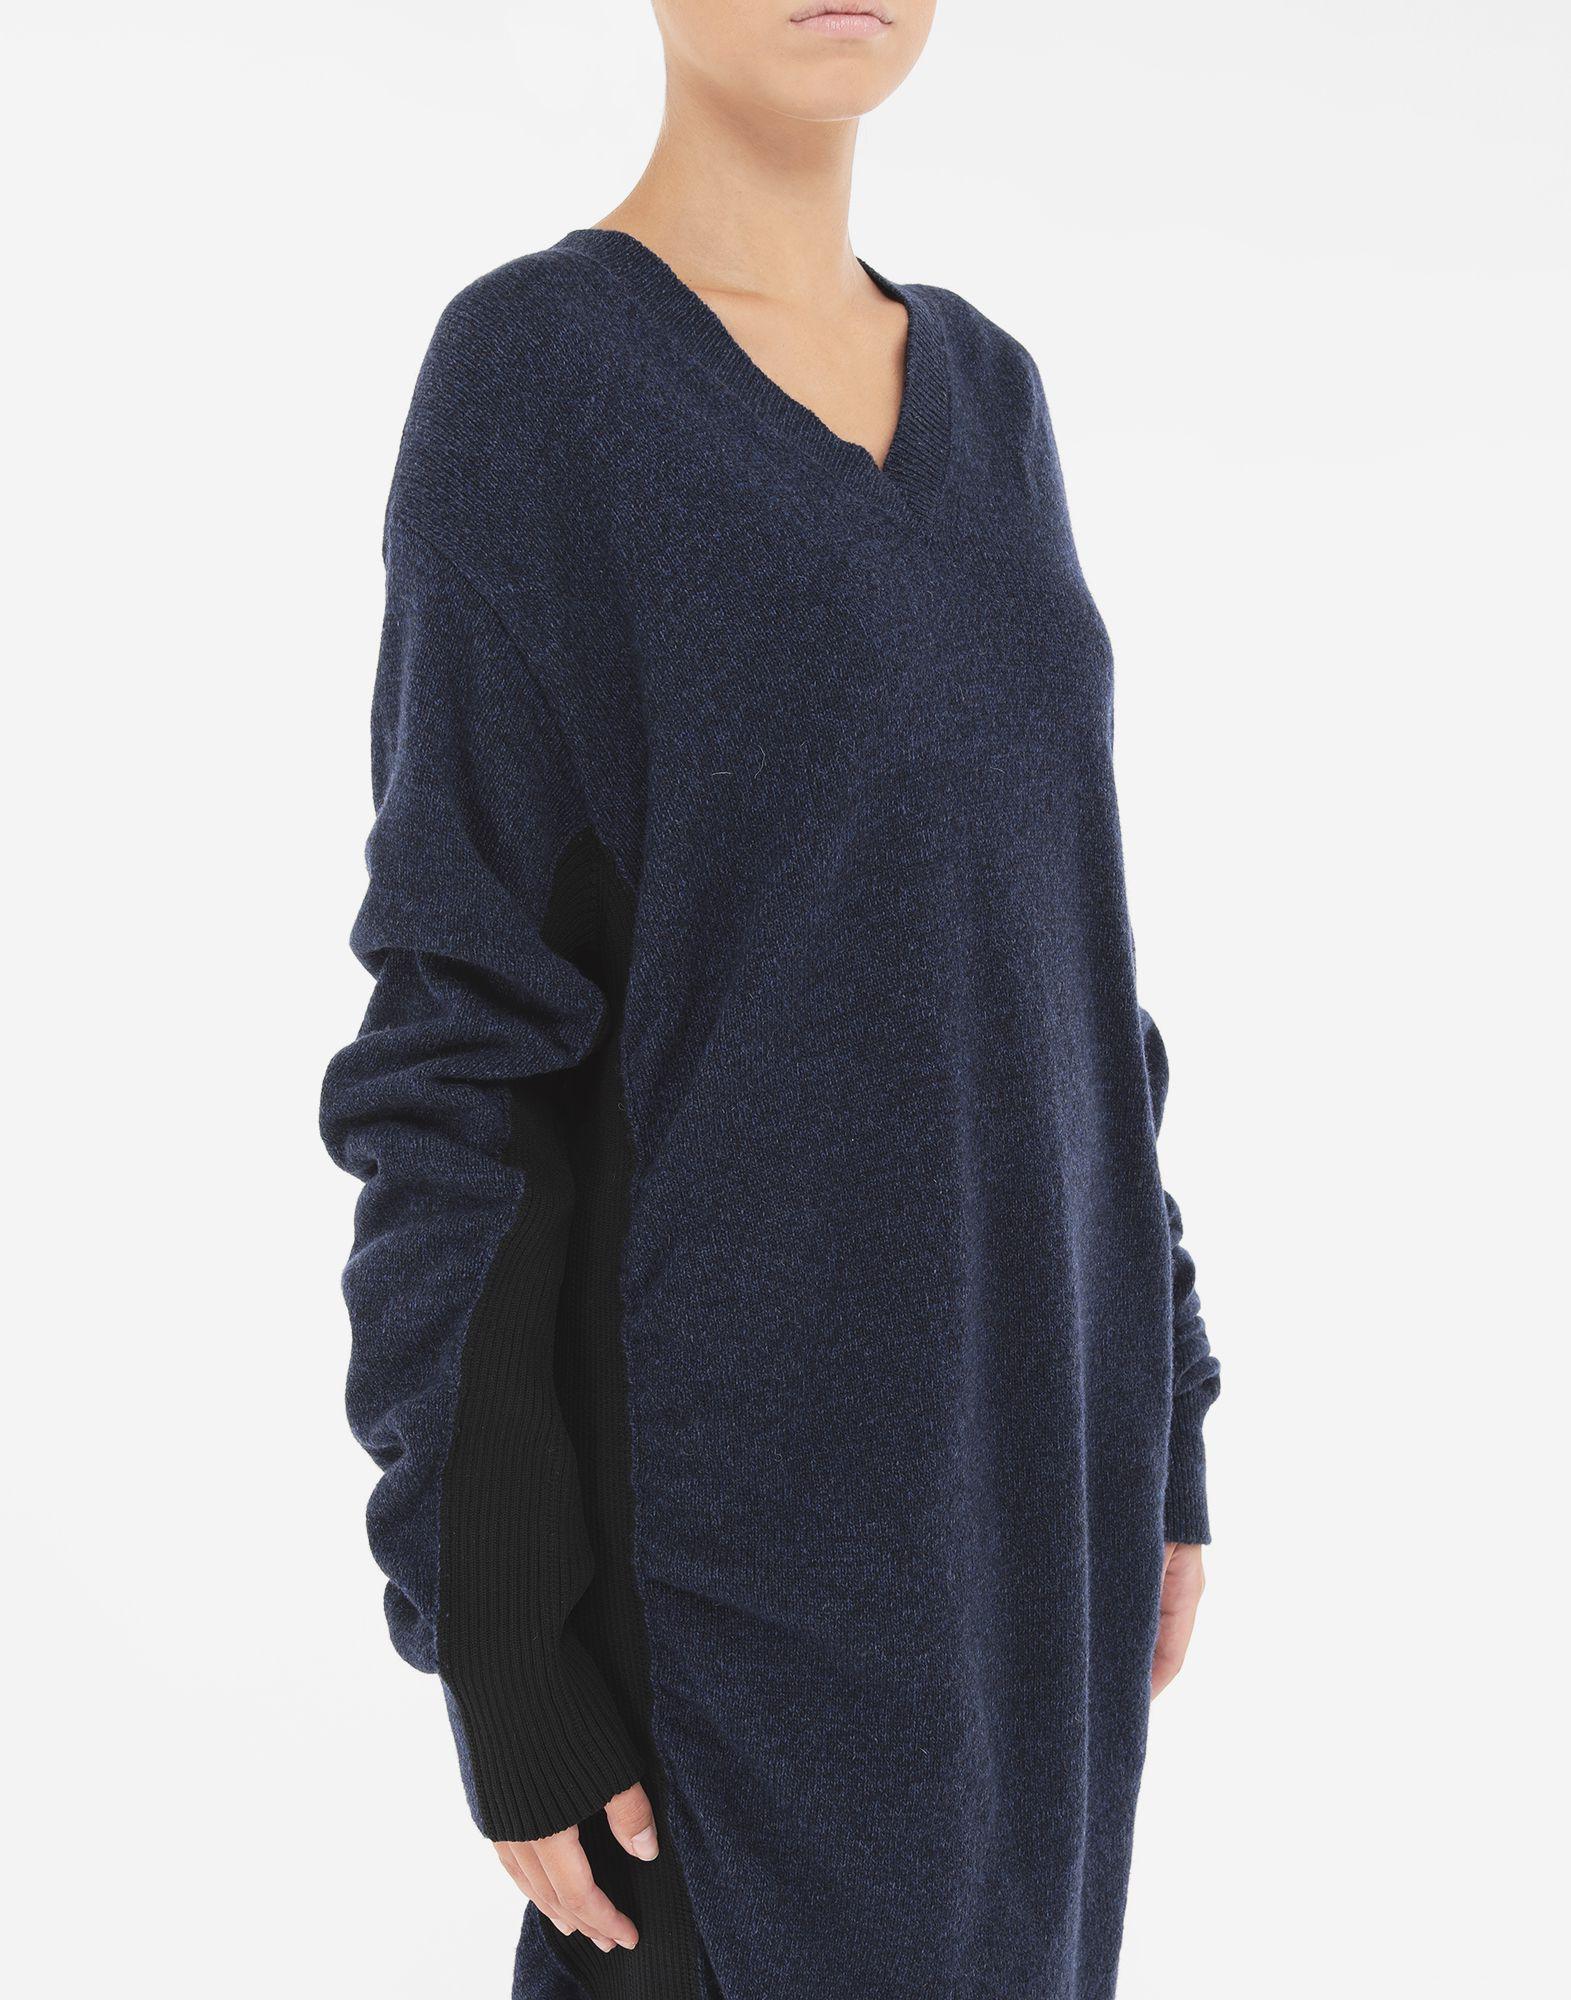 MM6 MAISON MARGIELA Ruched wool dress Dress Woman a